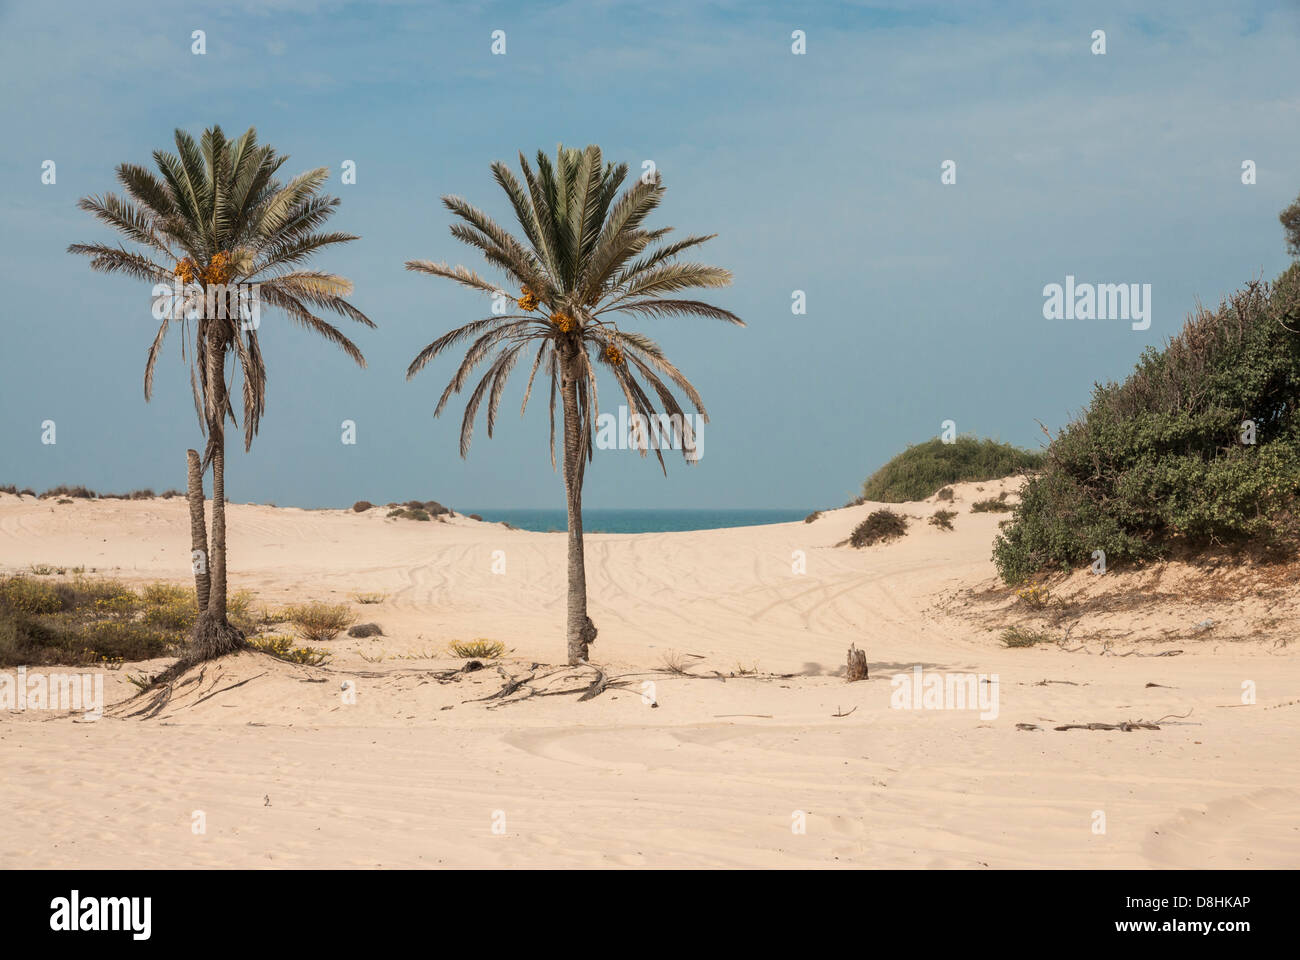 Israel. Two palm trees on a Sandy beach at Nitzanim, near the city of Ashkelon Stock Photo